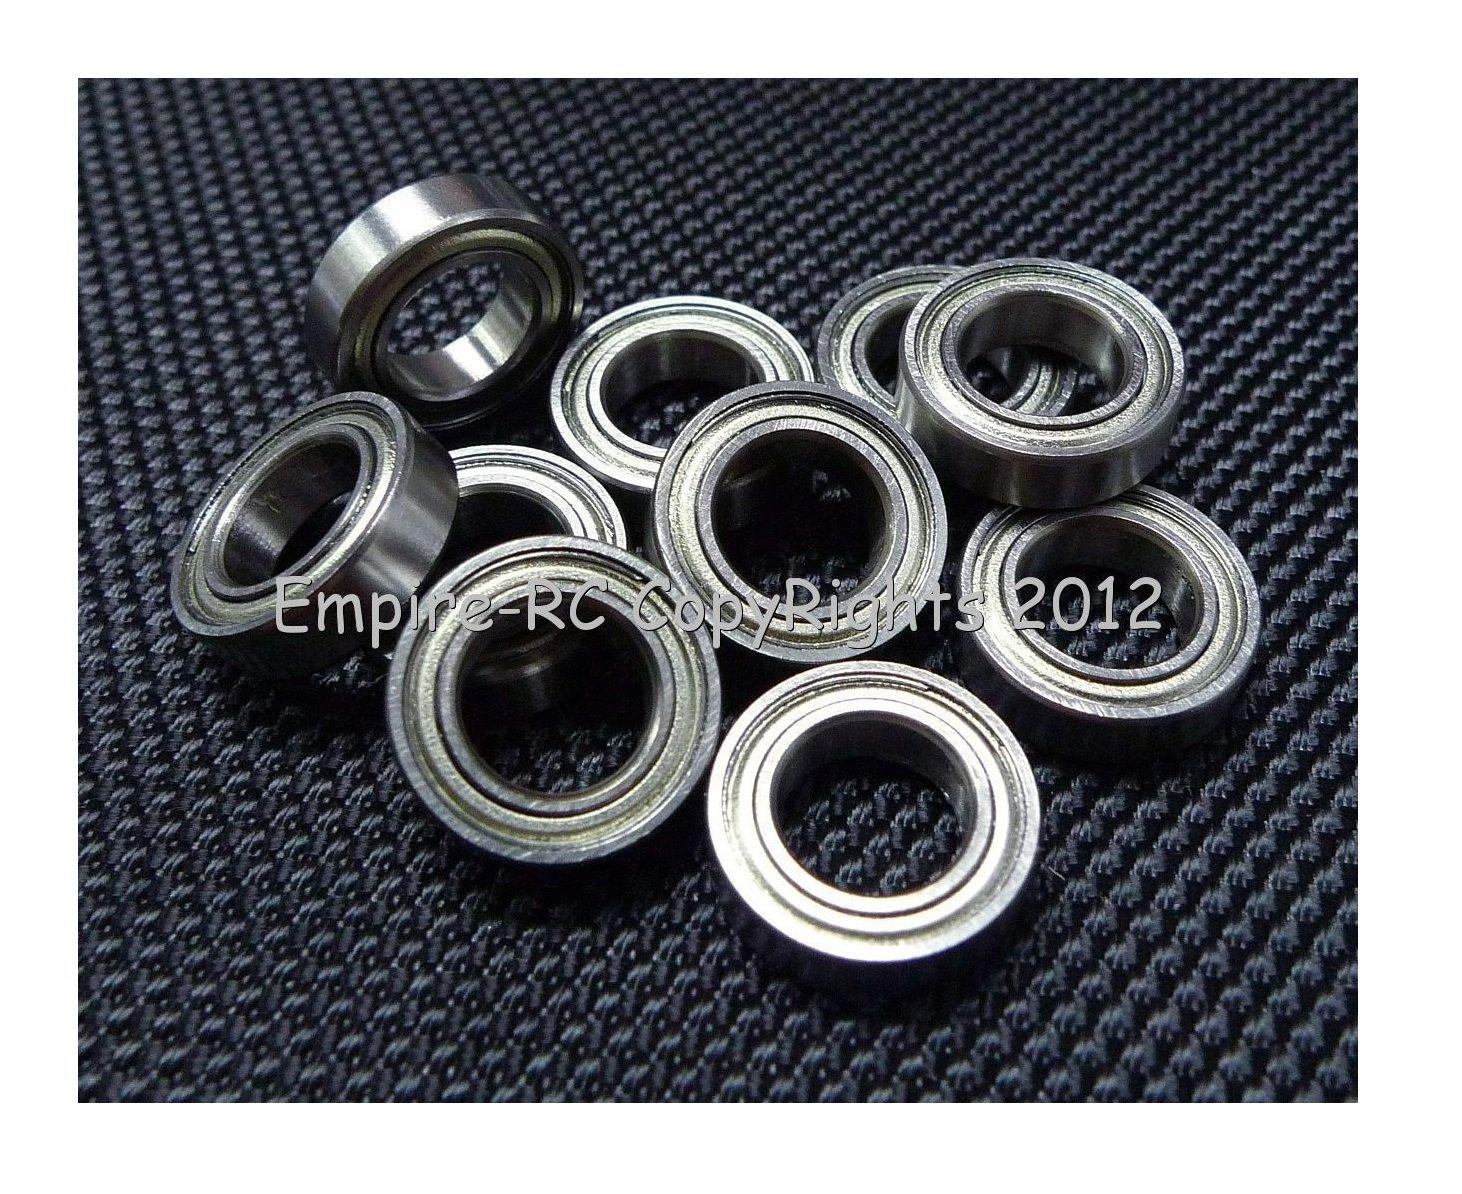 (4 PCS) (MR148ZZ) 8x14x4mm Metal Shielded Ball Bearing For ALIGN T-REX TREX 600